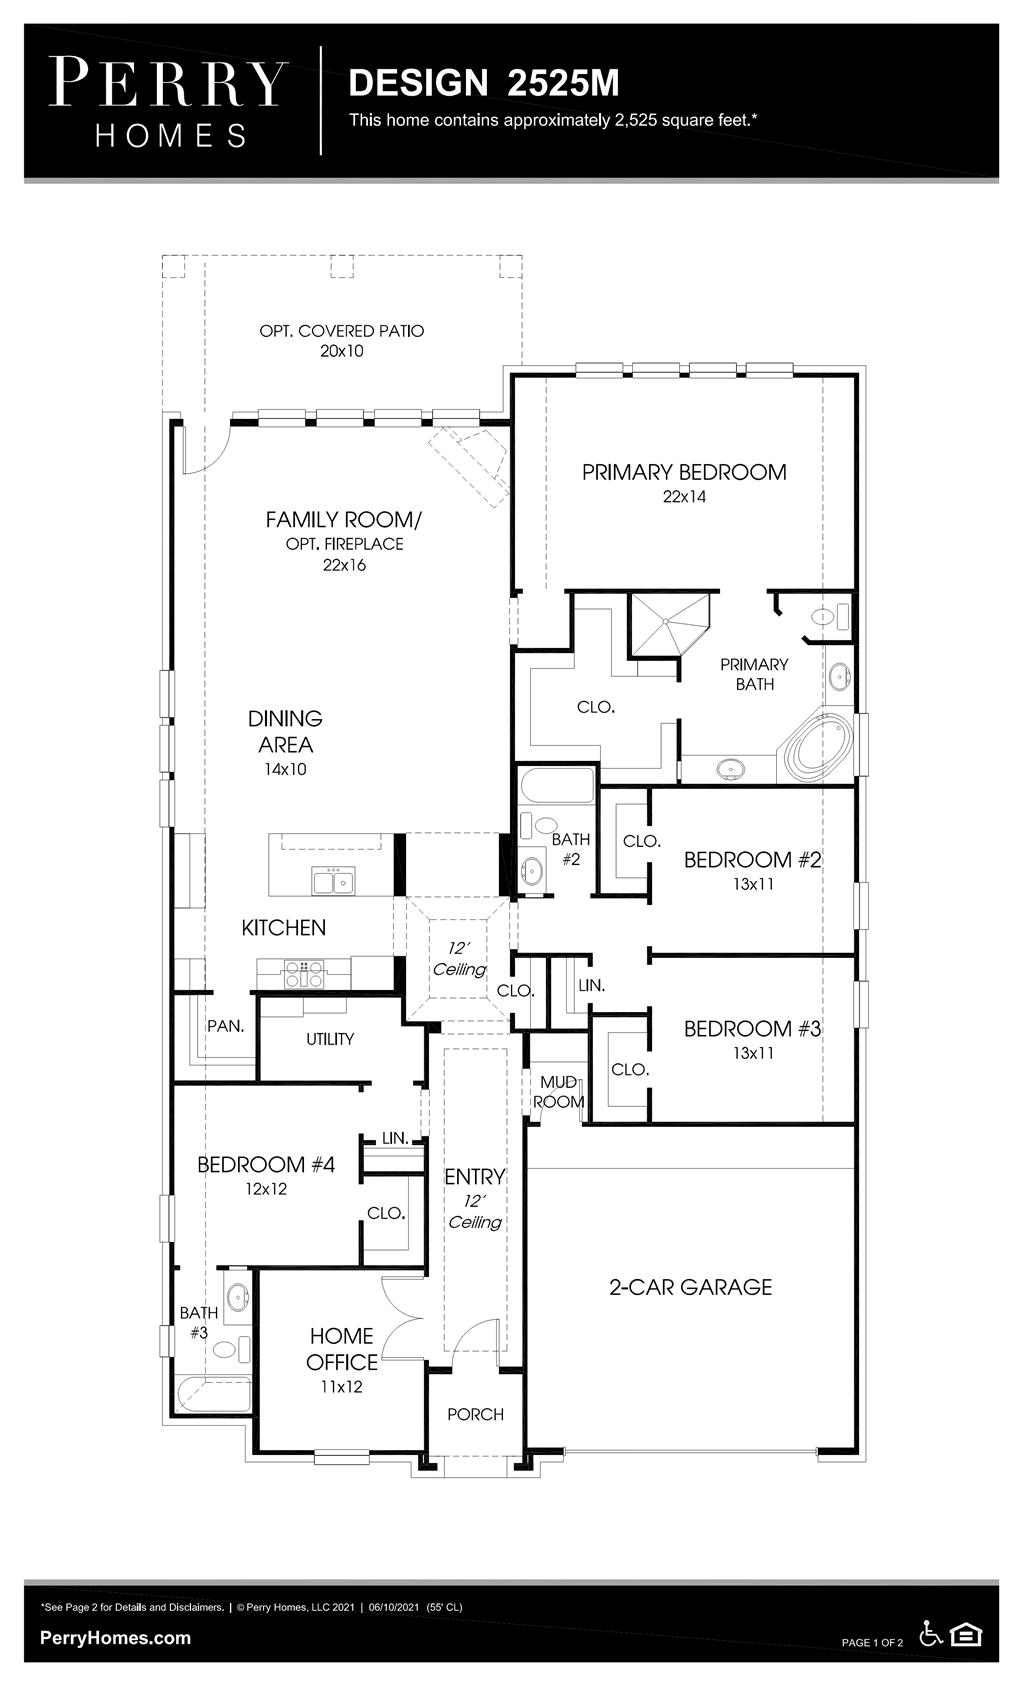 Floor Plan for 2525M